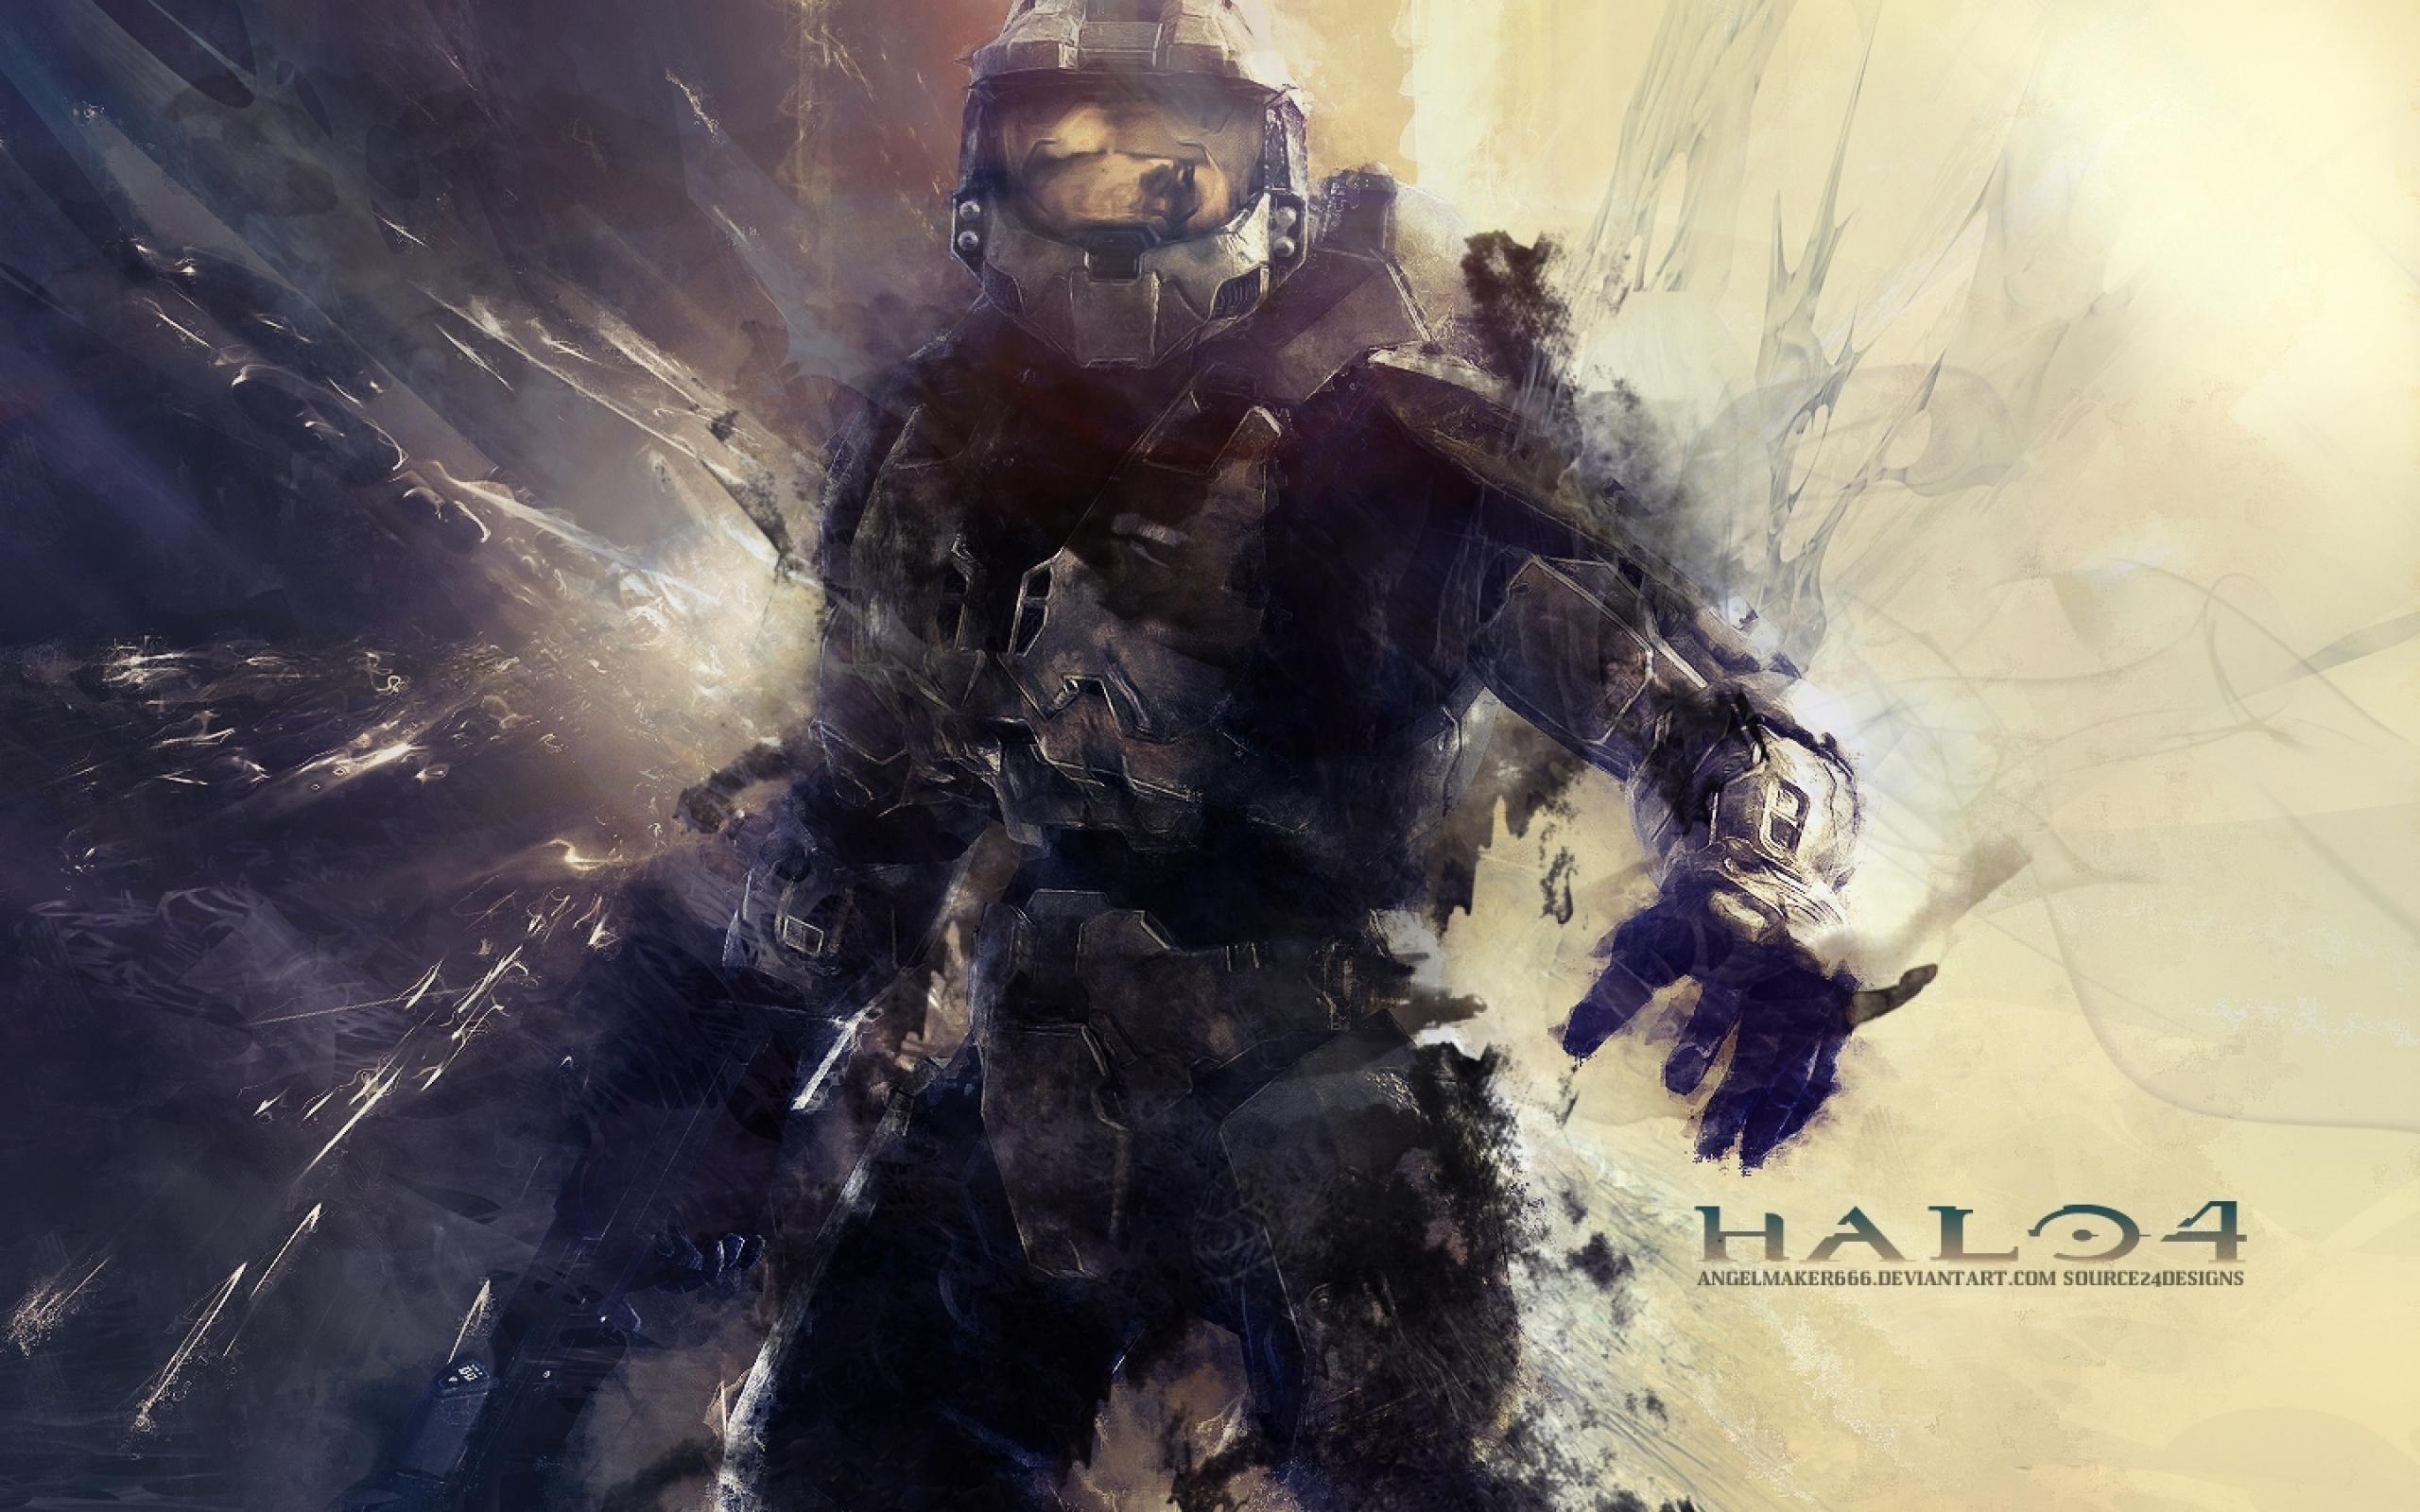 Halo 4 Images Desktop Wallpaper #06579